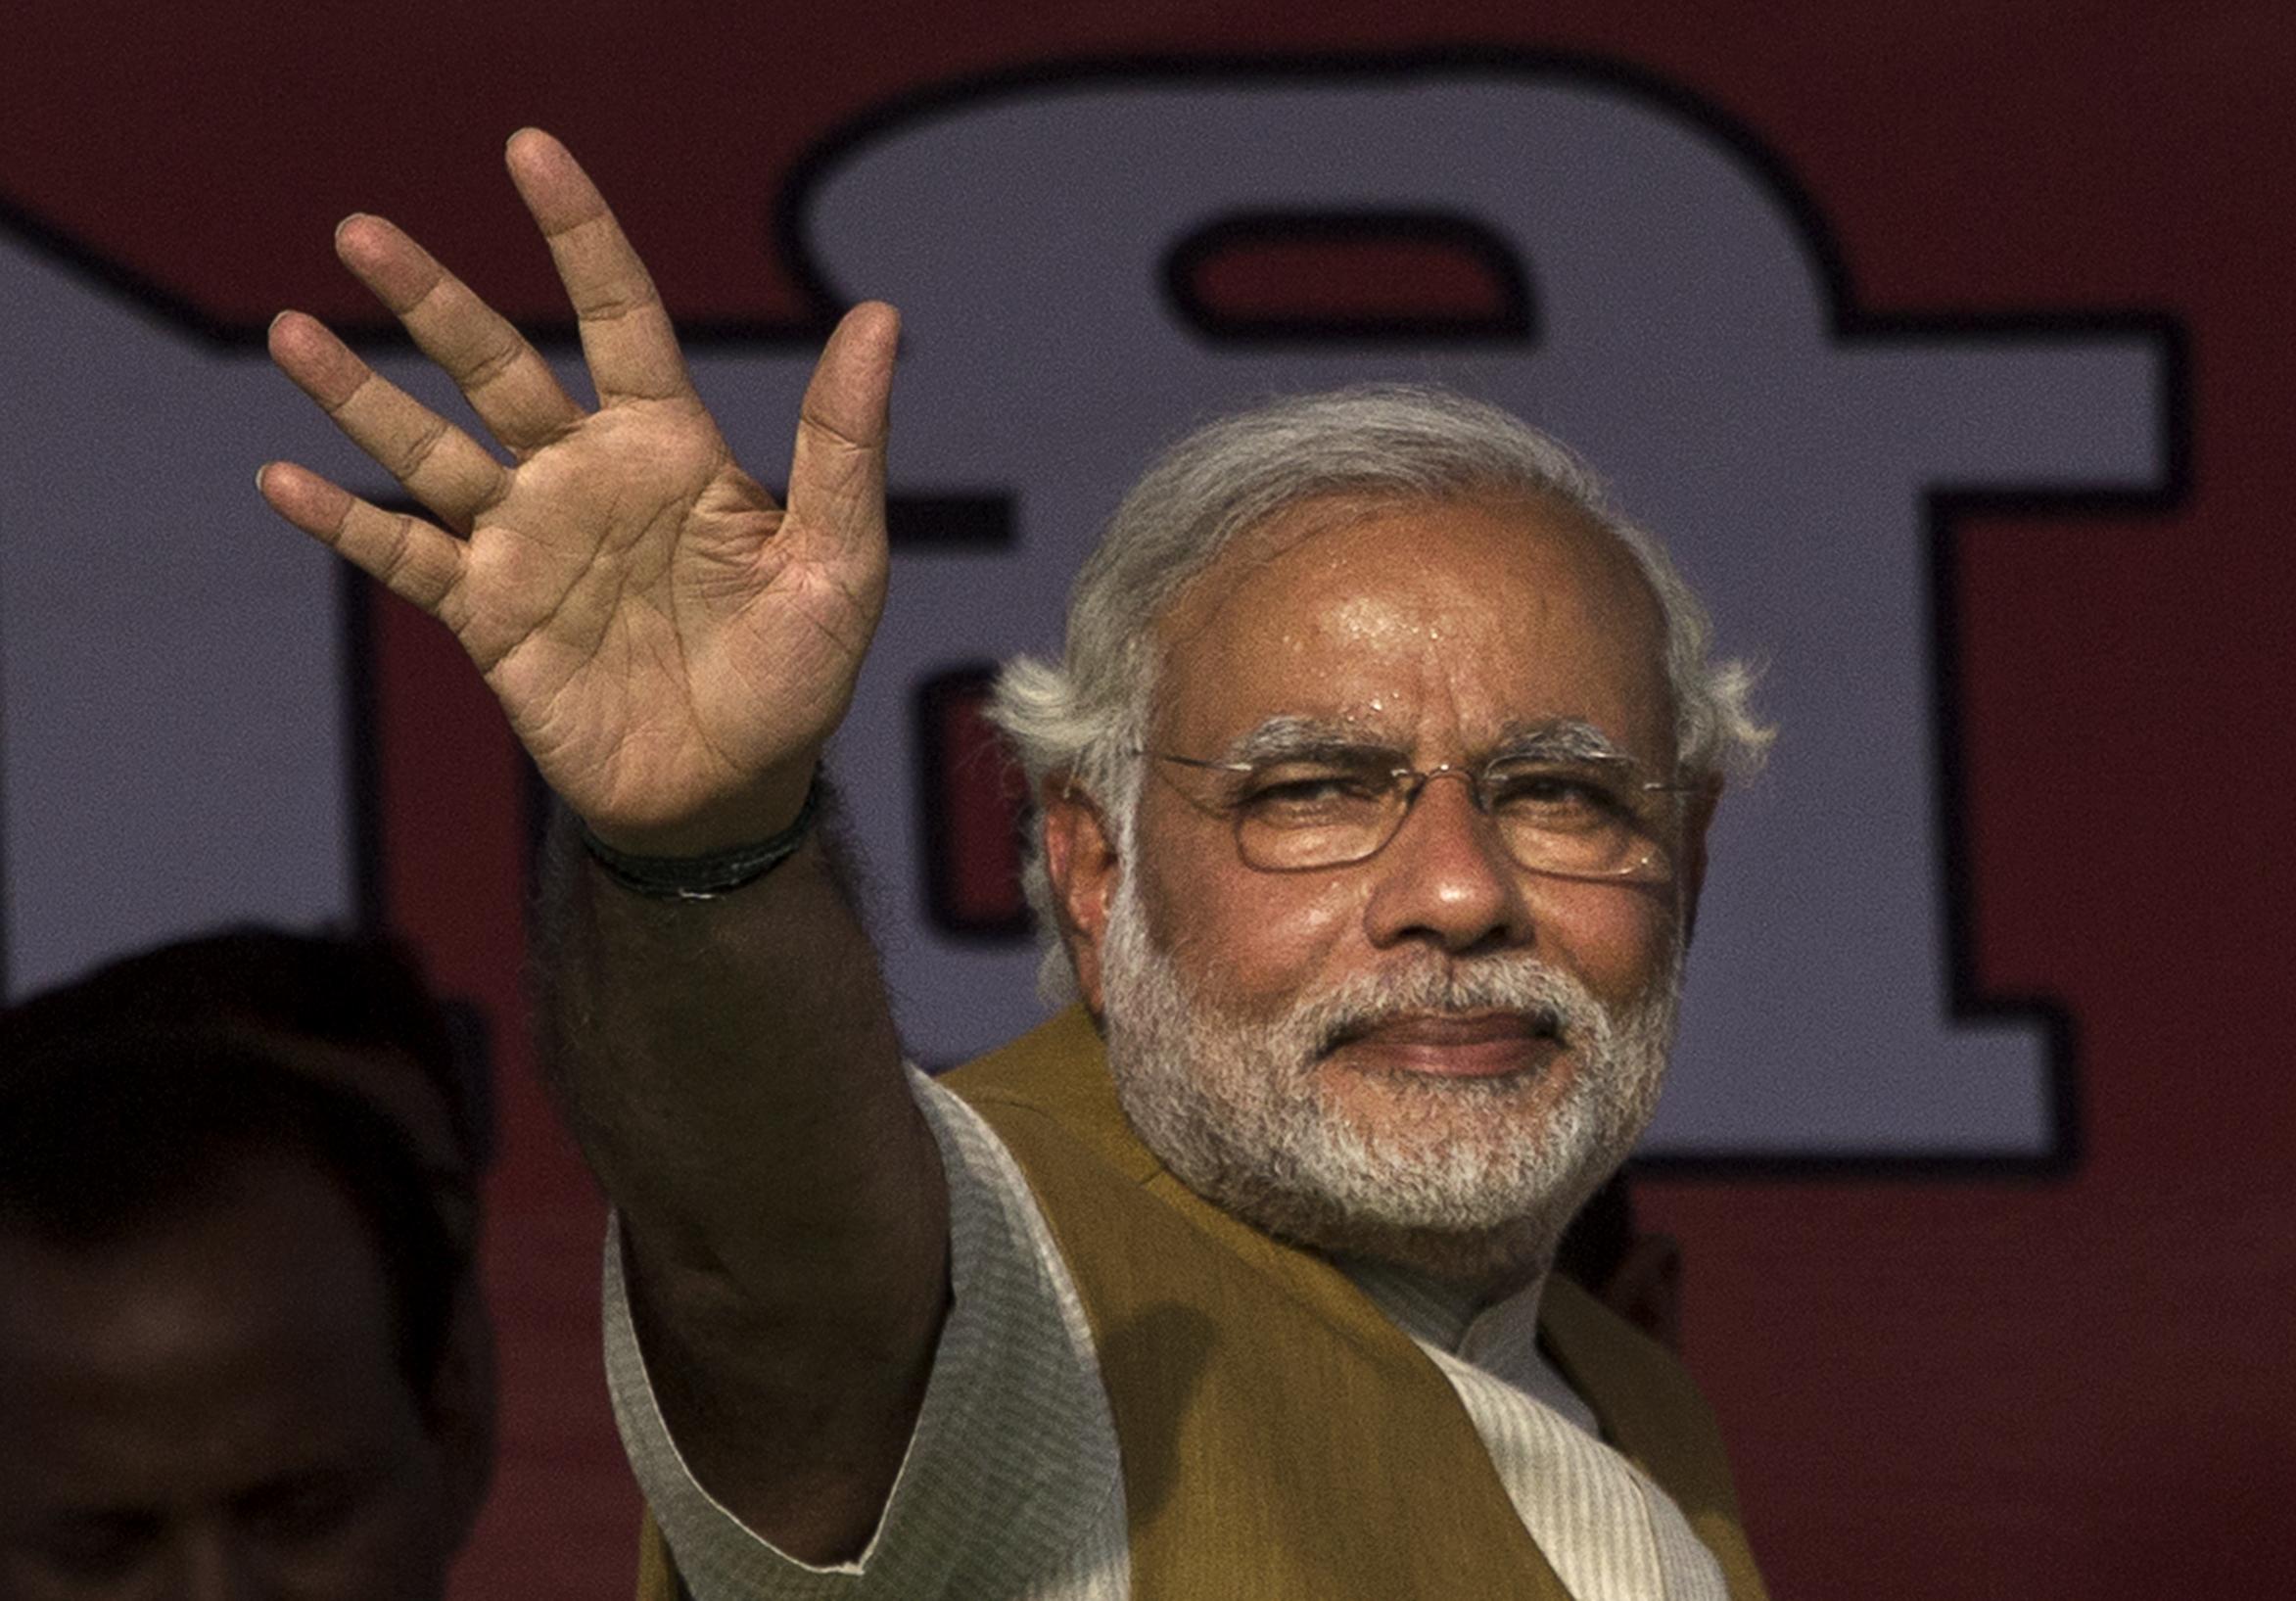 BJP's Narendra Modi Campaigns In Punjab